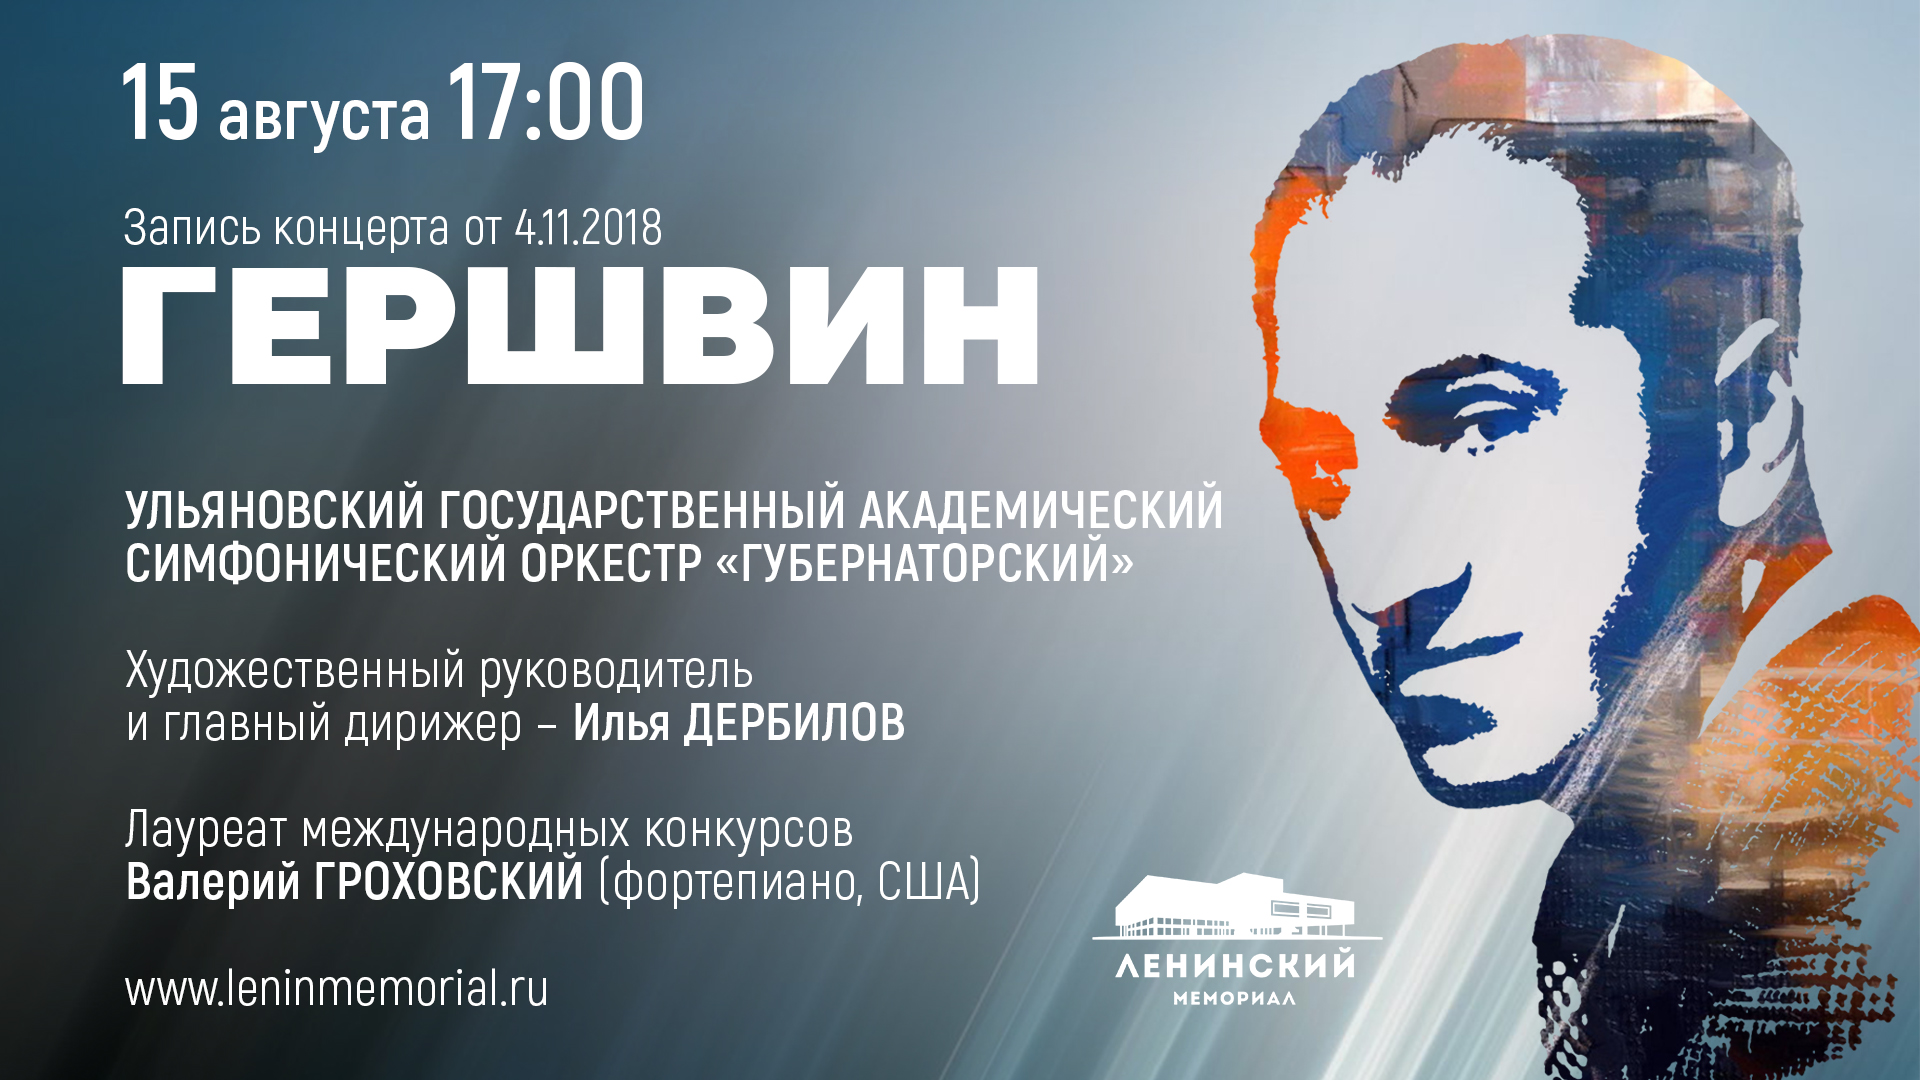 Онлайн-трансляции концерта «ГЕРШВИН»